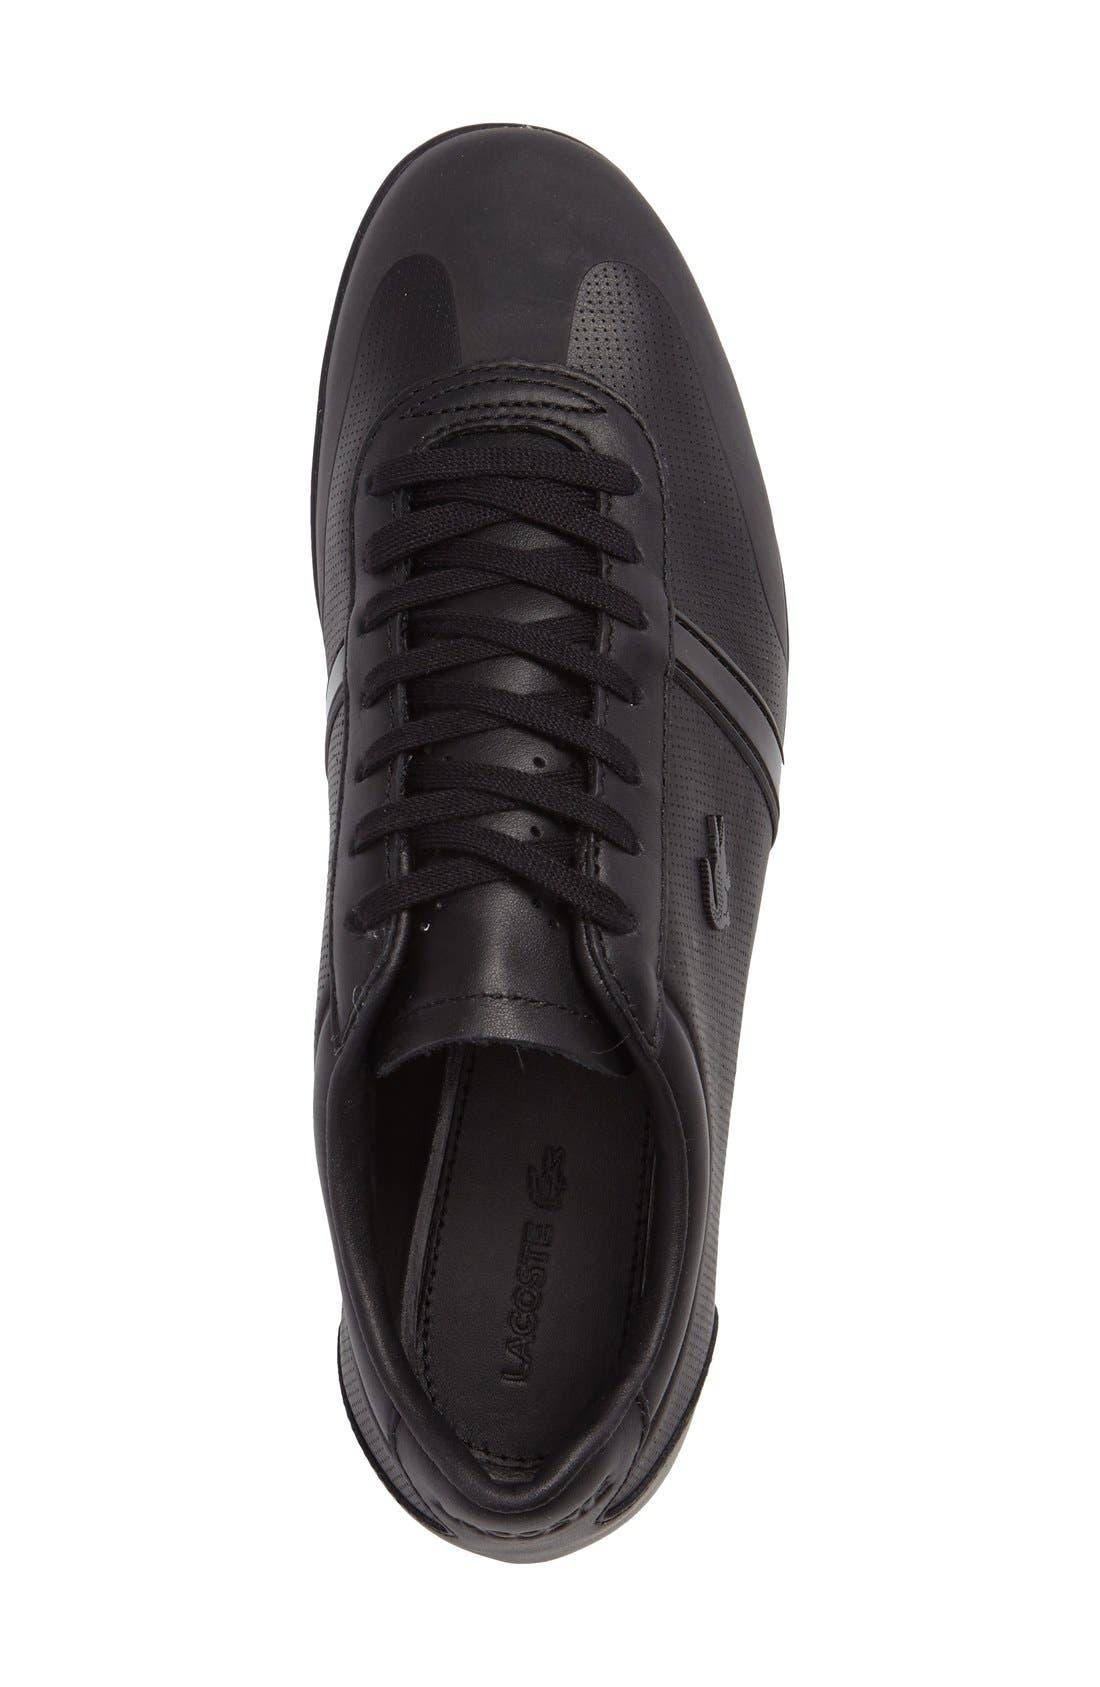 Mokara Sneaker,                             Alternate thumbnail 3, color,                             008